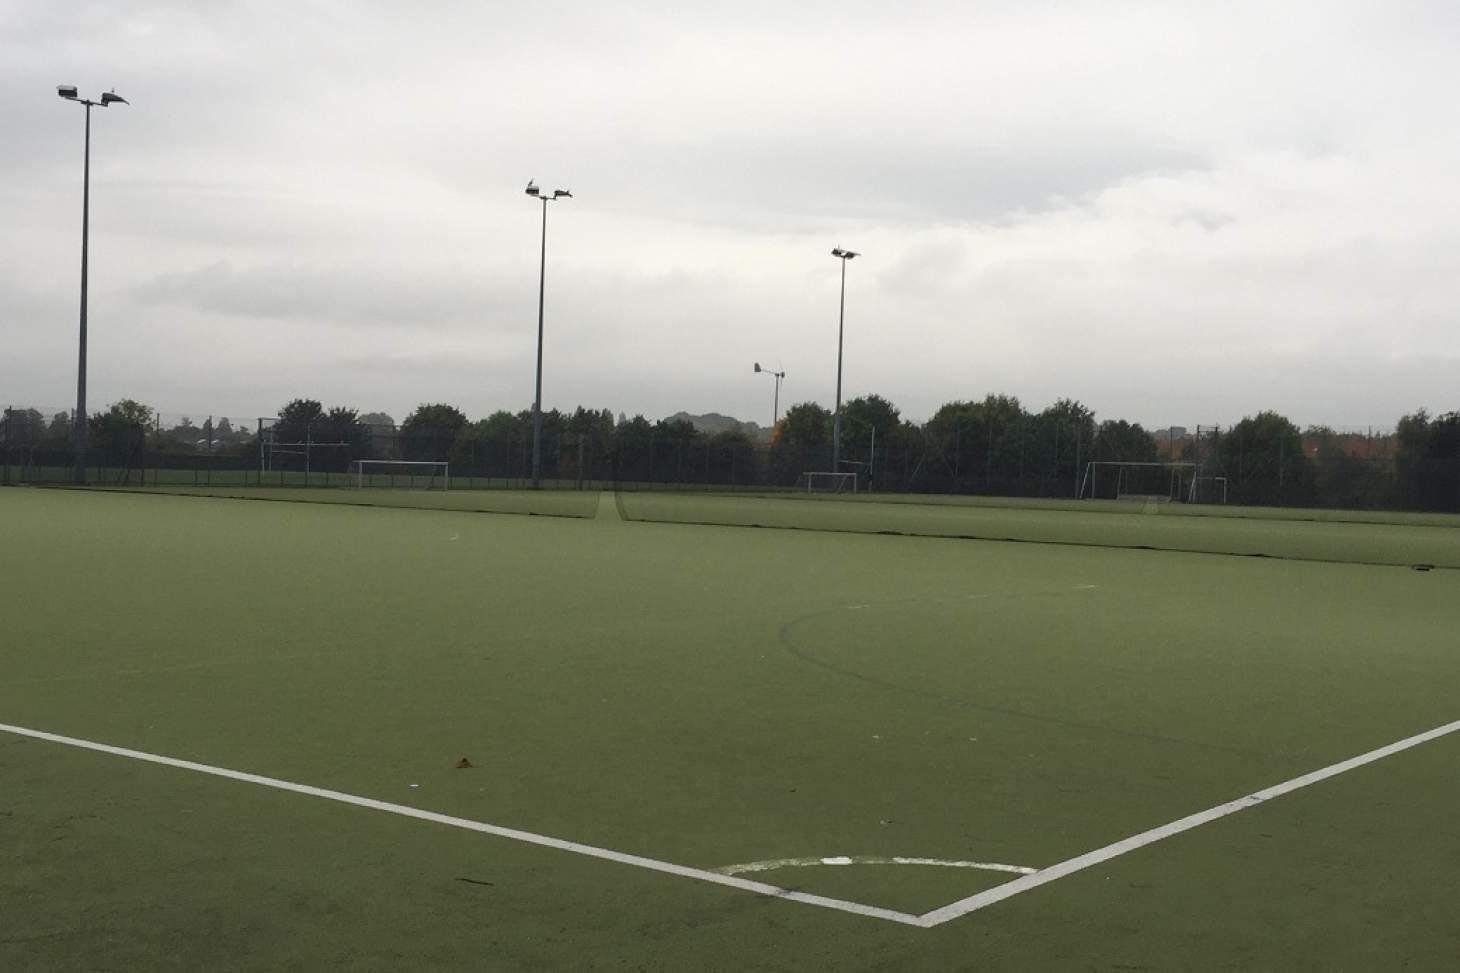 National Church of England Academy 5 a side | Astroturf football pitch